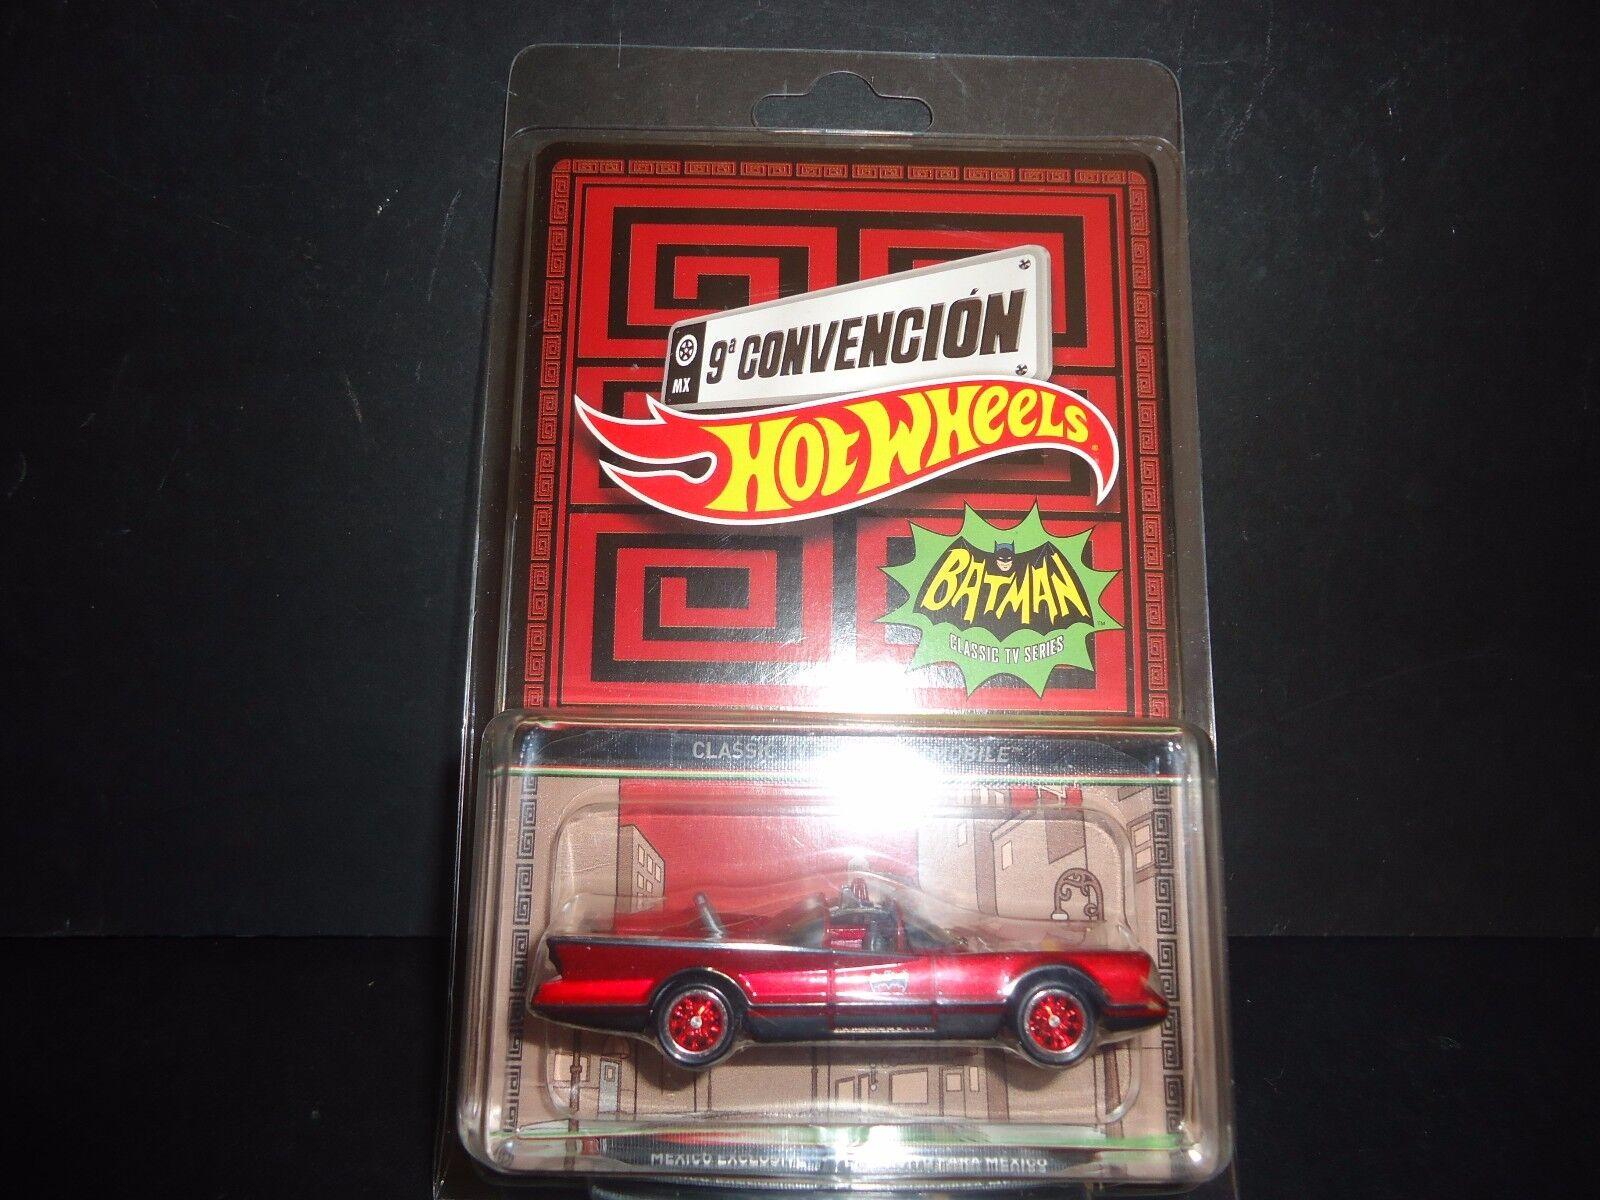 Hot Wheels Batmobile 1966 Série Tv 2016 Mexique Convention Convention Convention 1 64 Rare 8227a4